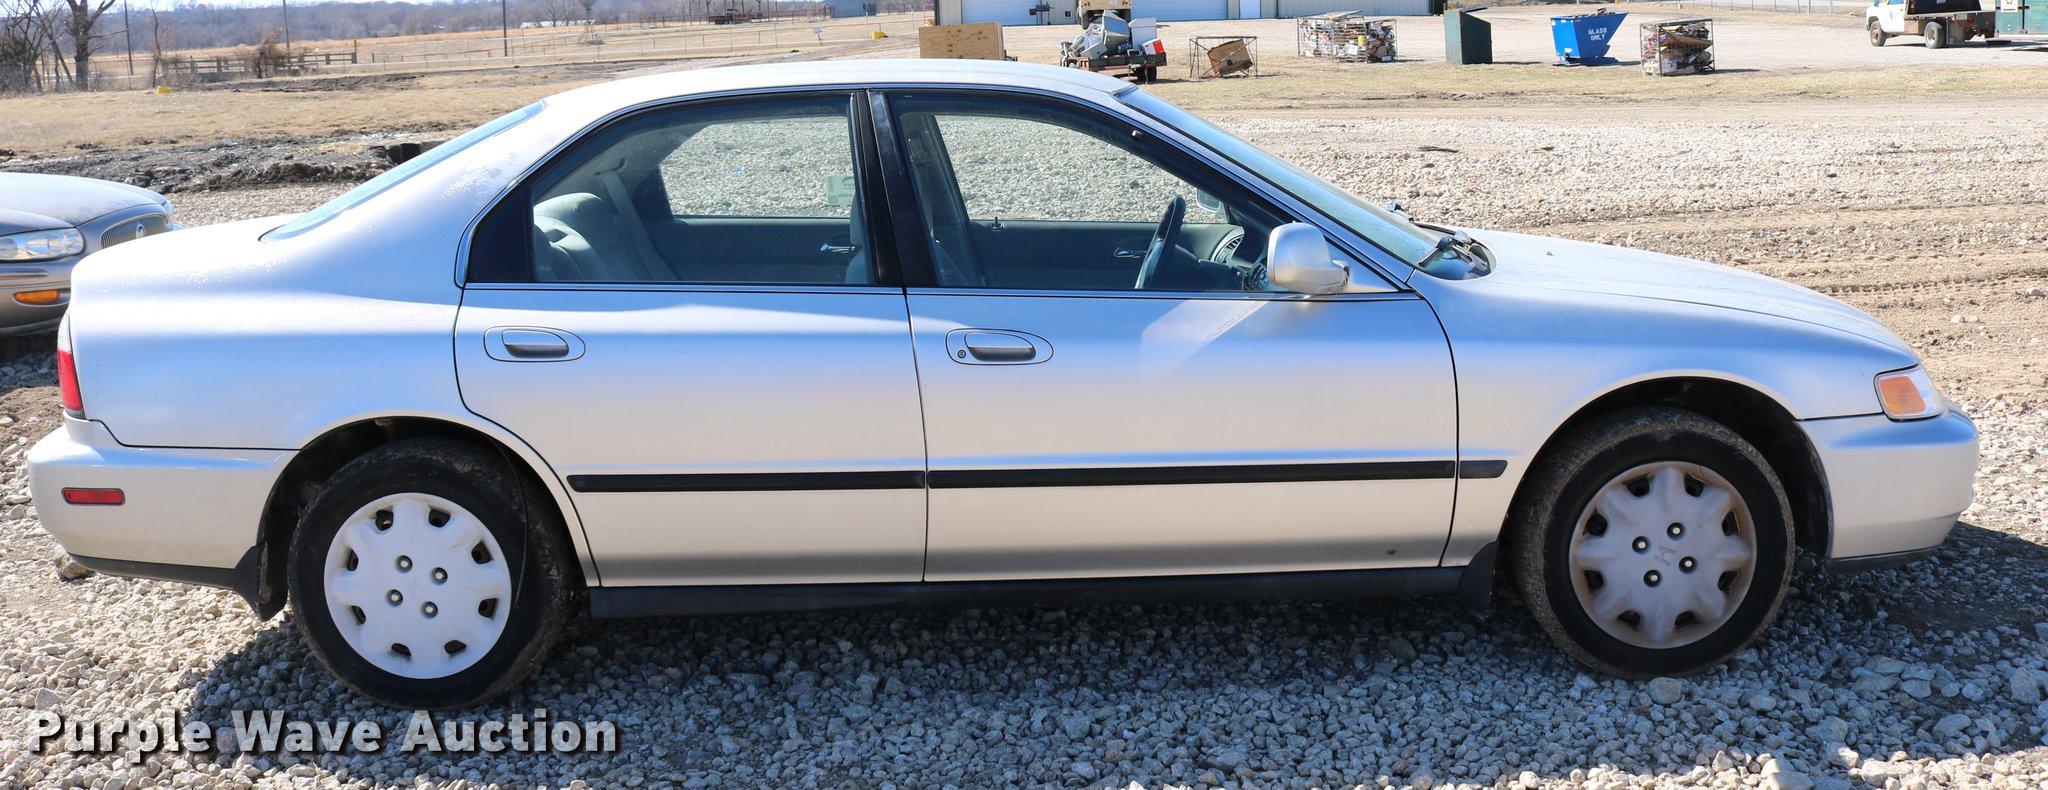 Honda honda accord 1996 : 1996 Honda Accord | Item DB6564 | Tuesday April 3 Government...